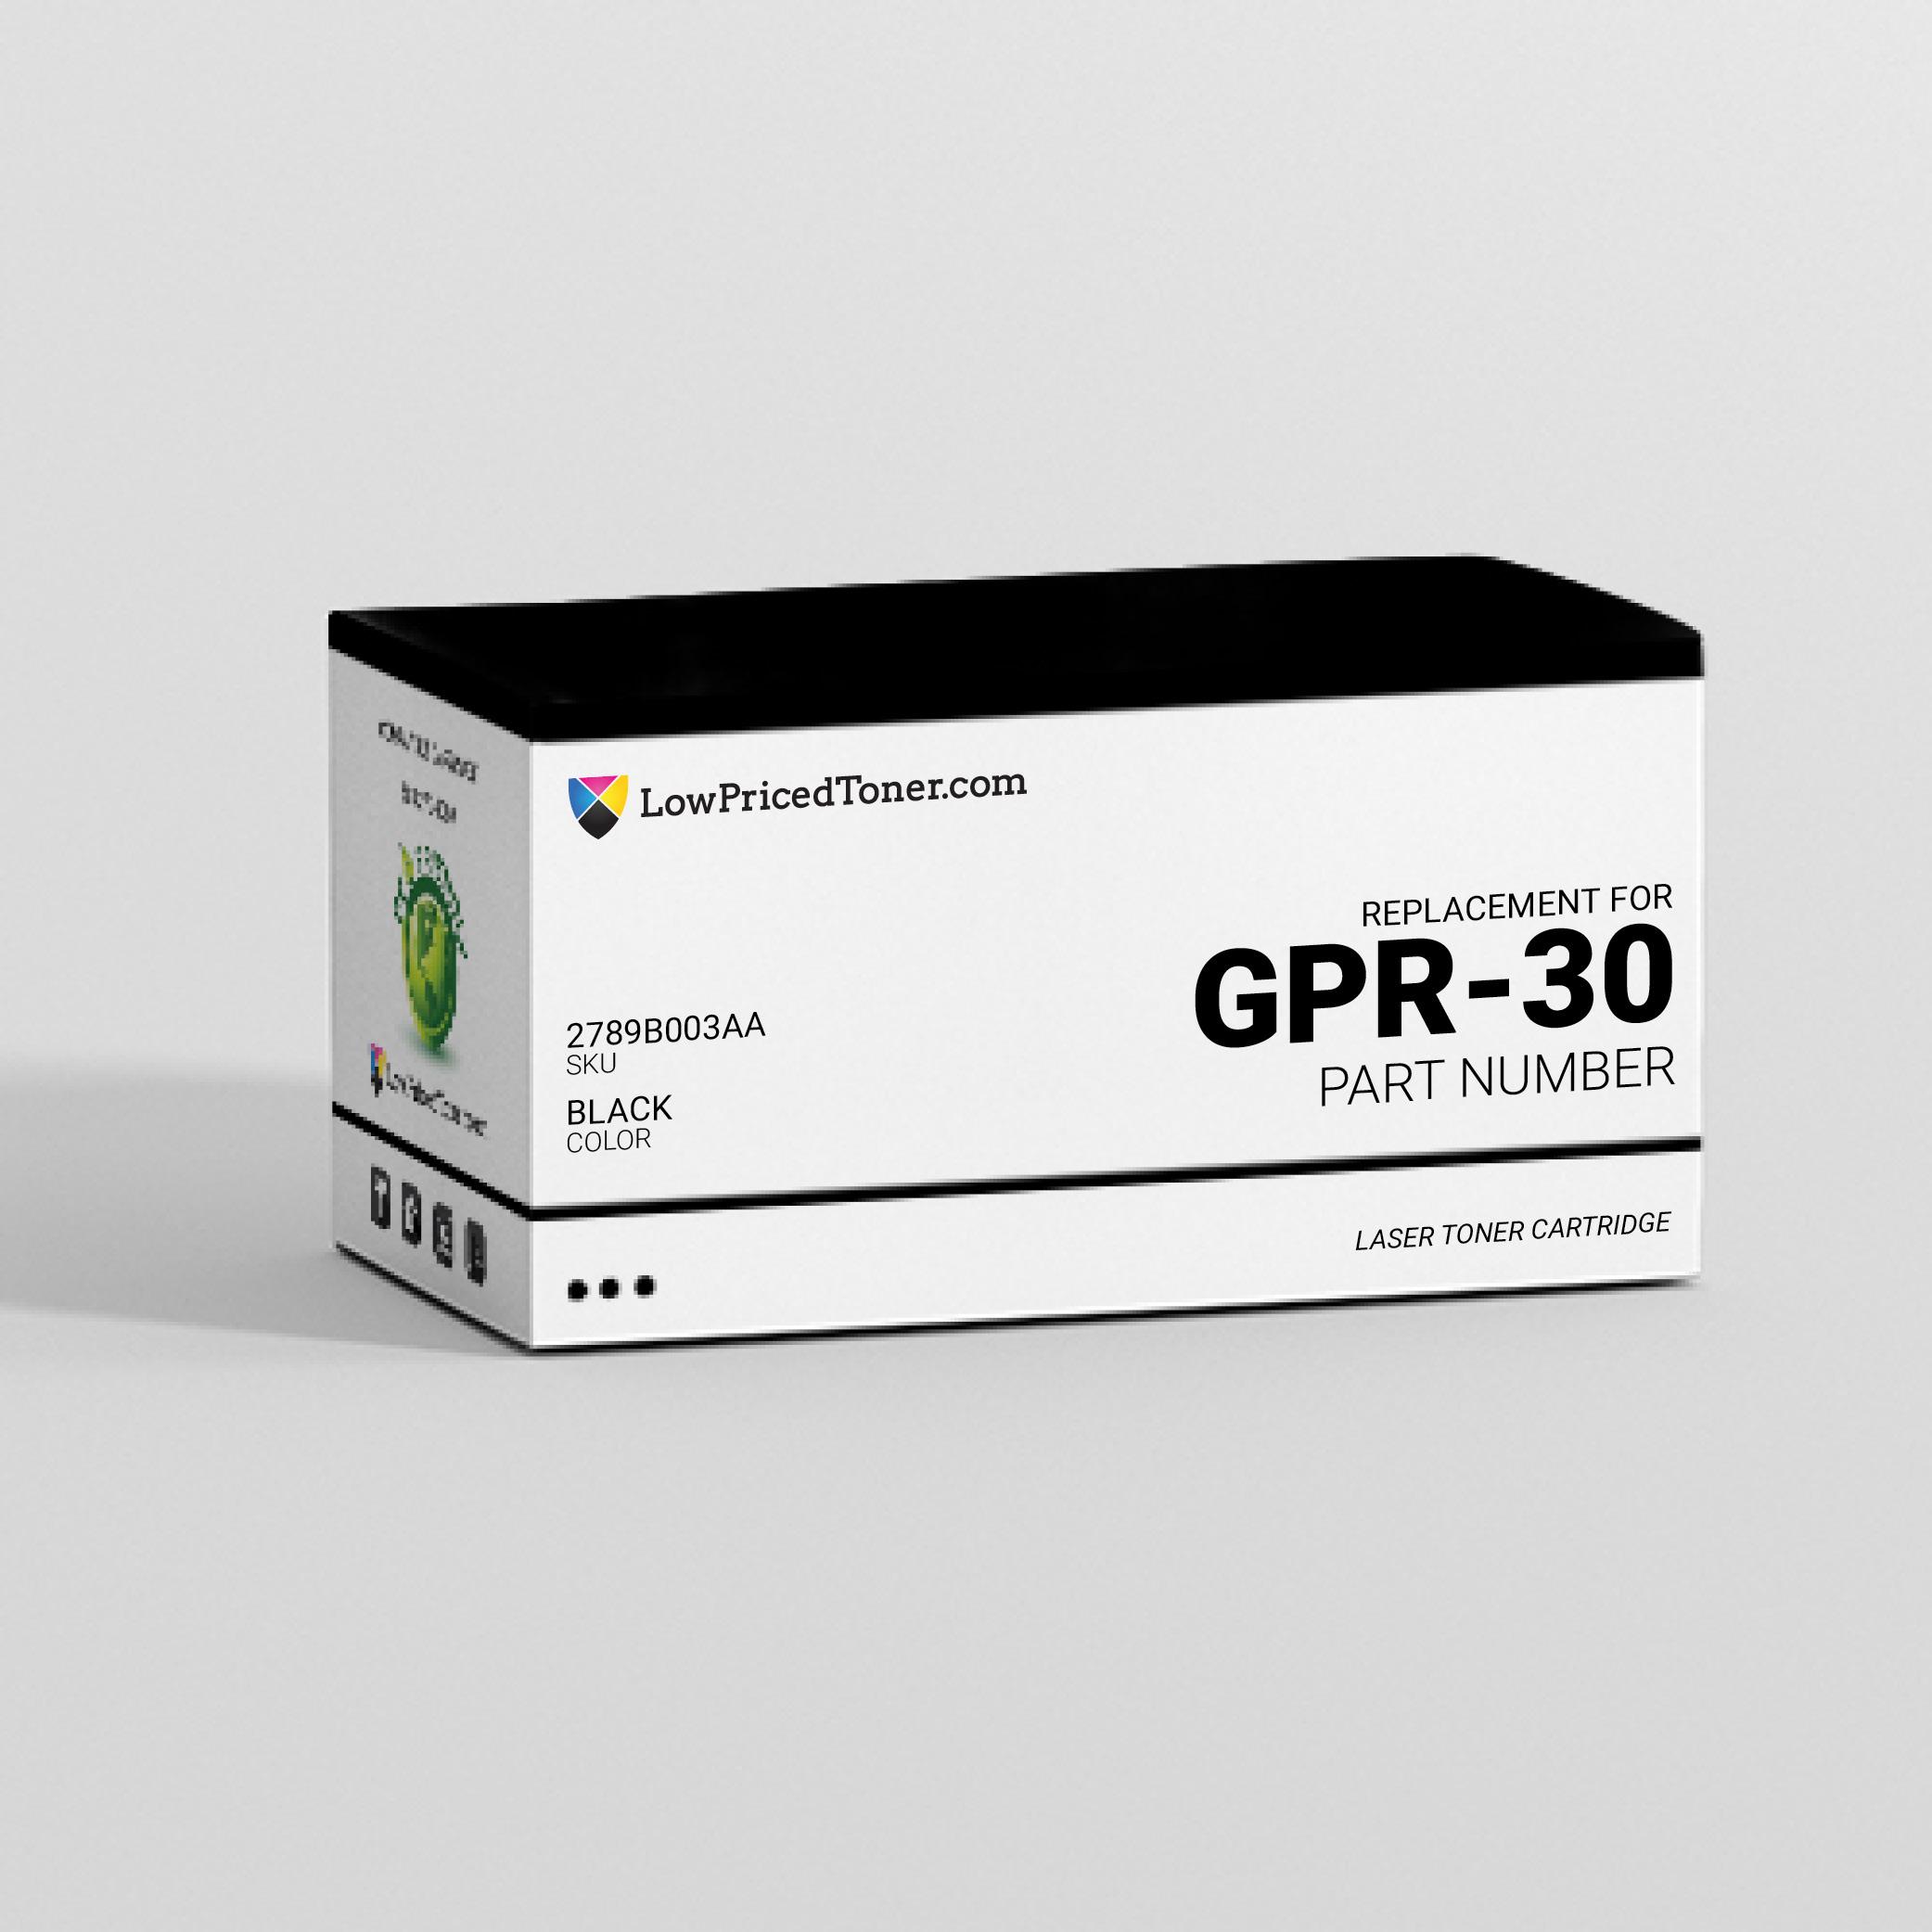 Canon 2789B003AA GPR-30 Compatible Black Laser Toner Cartridge